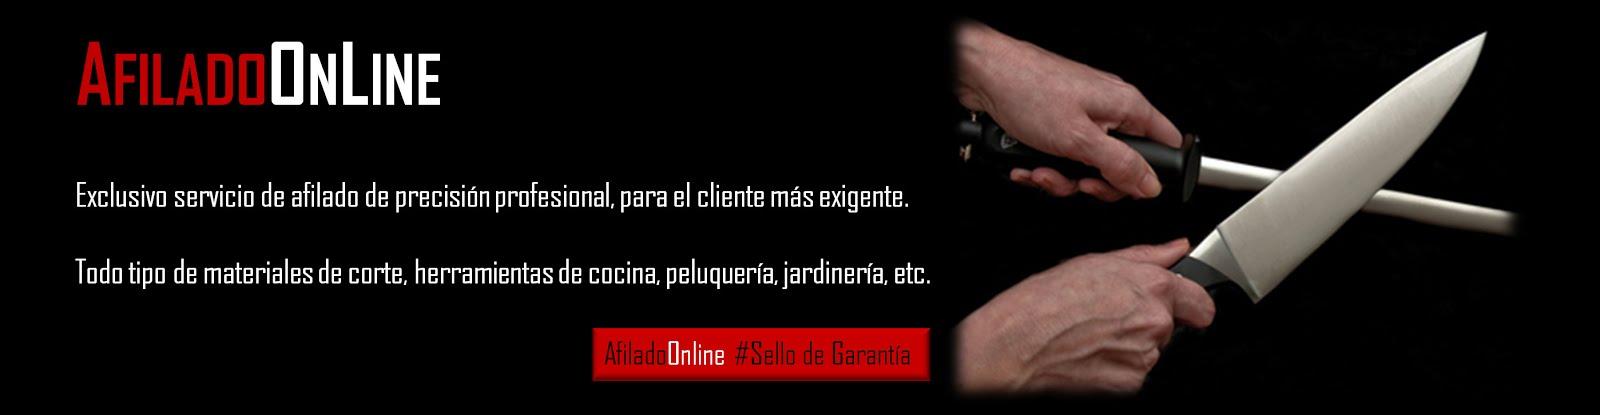 AFILADO ONLINE